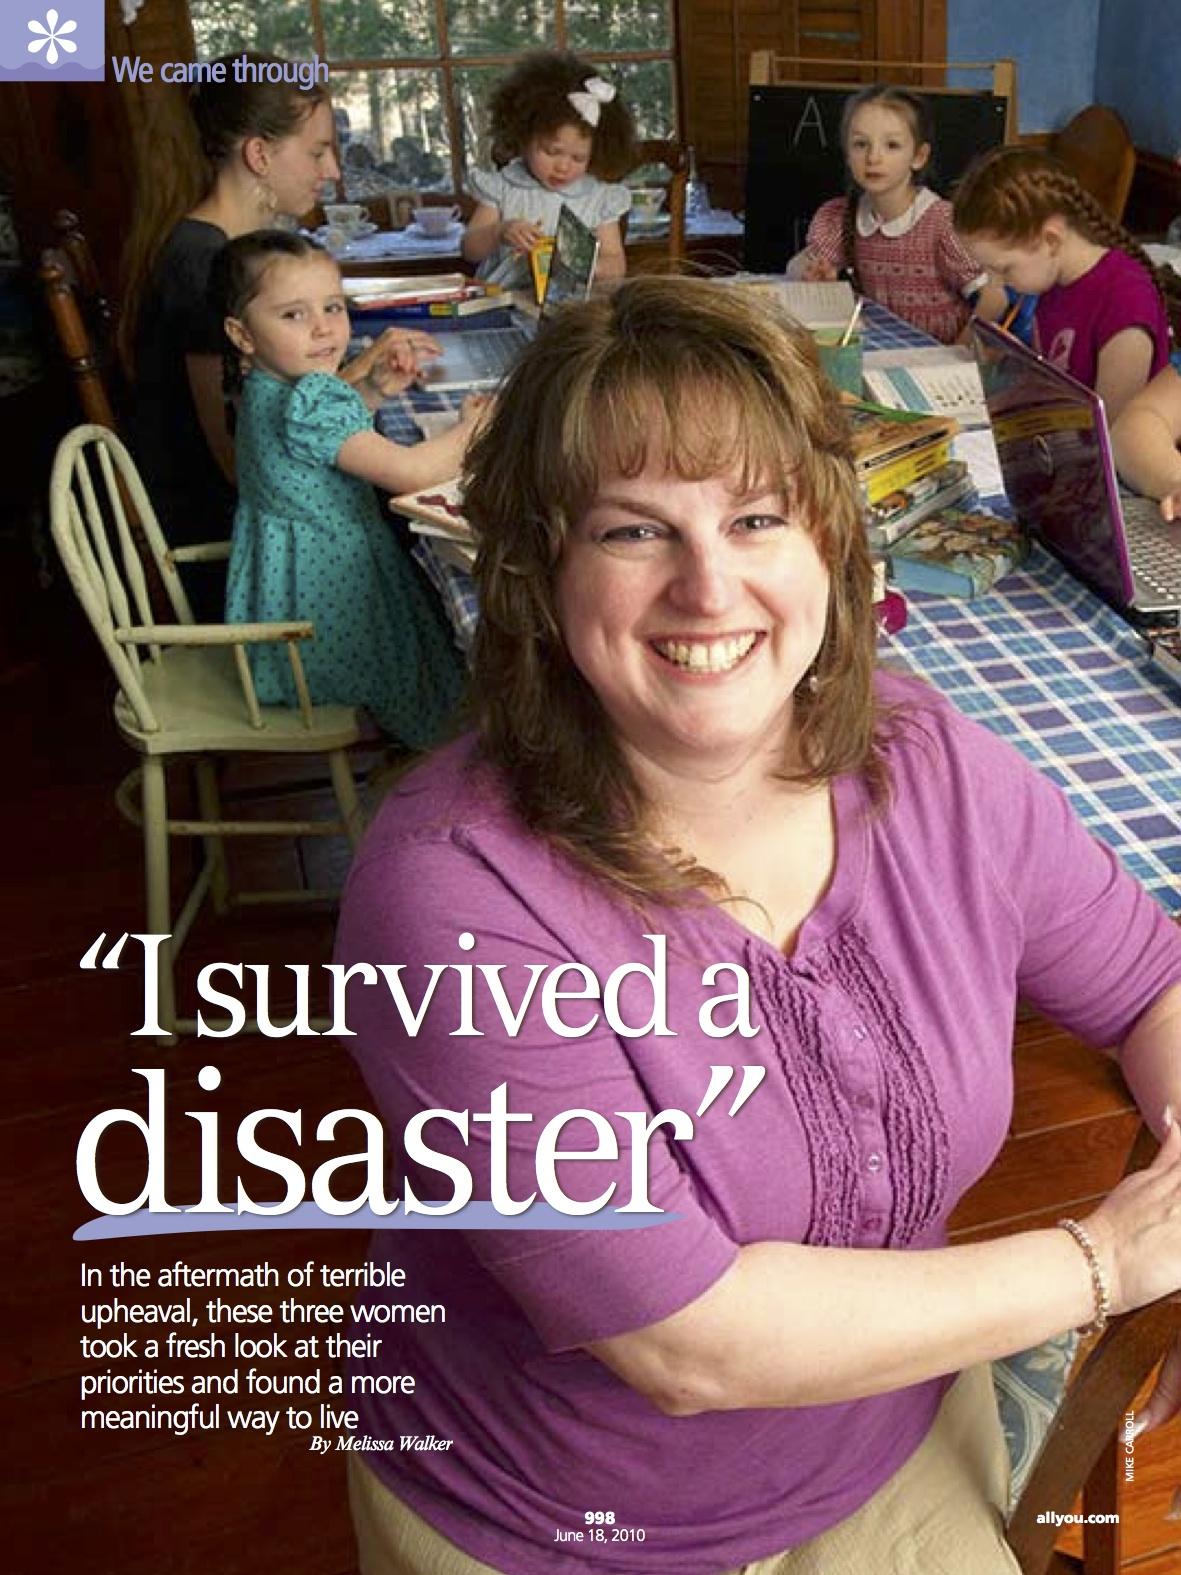 I survived a disaster-1.jpg